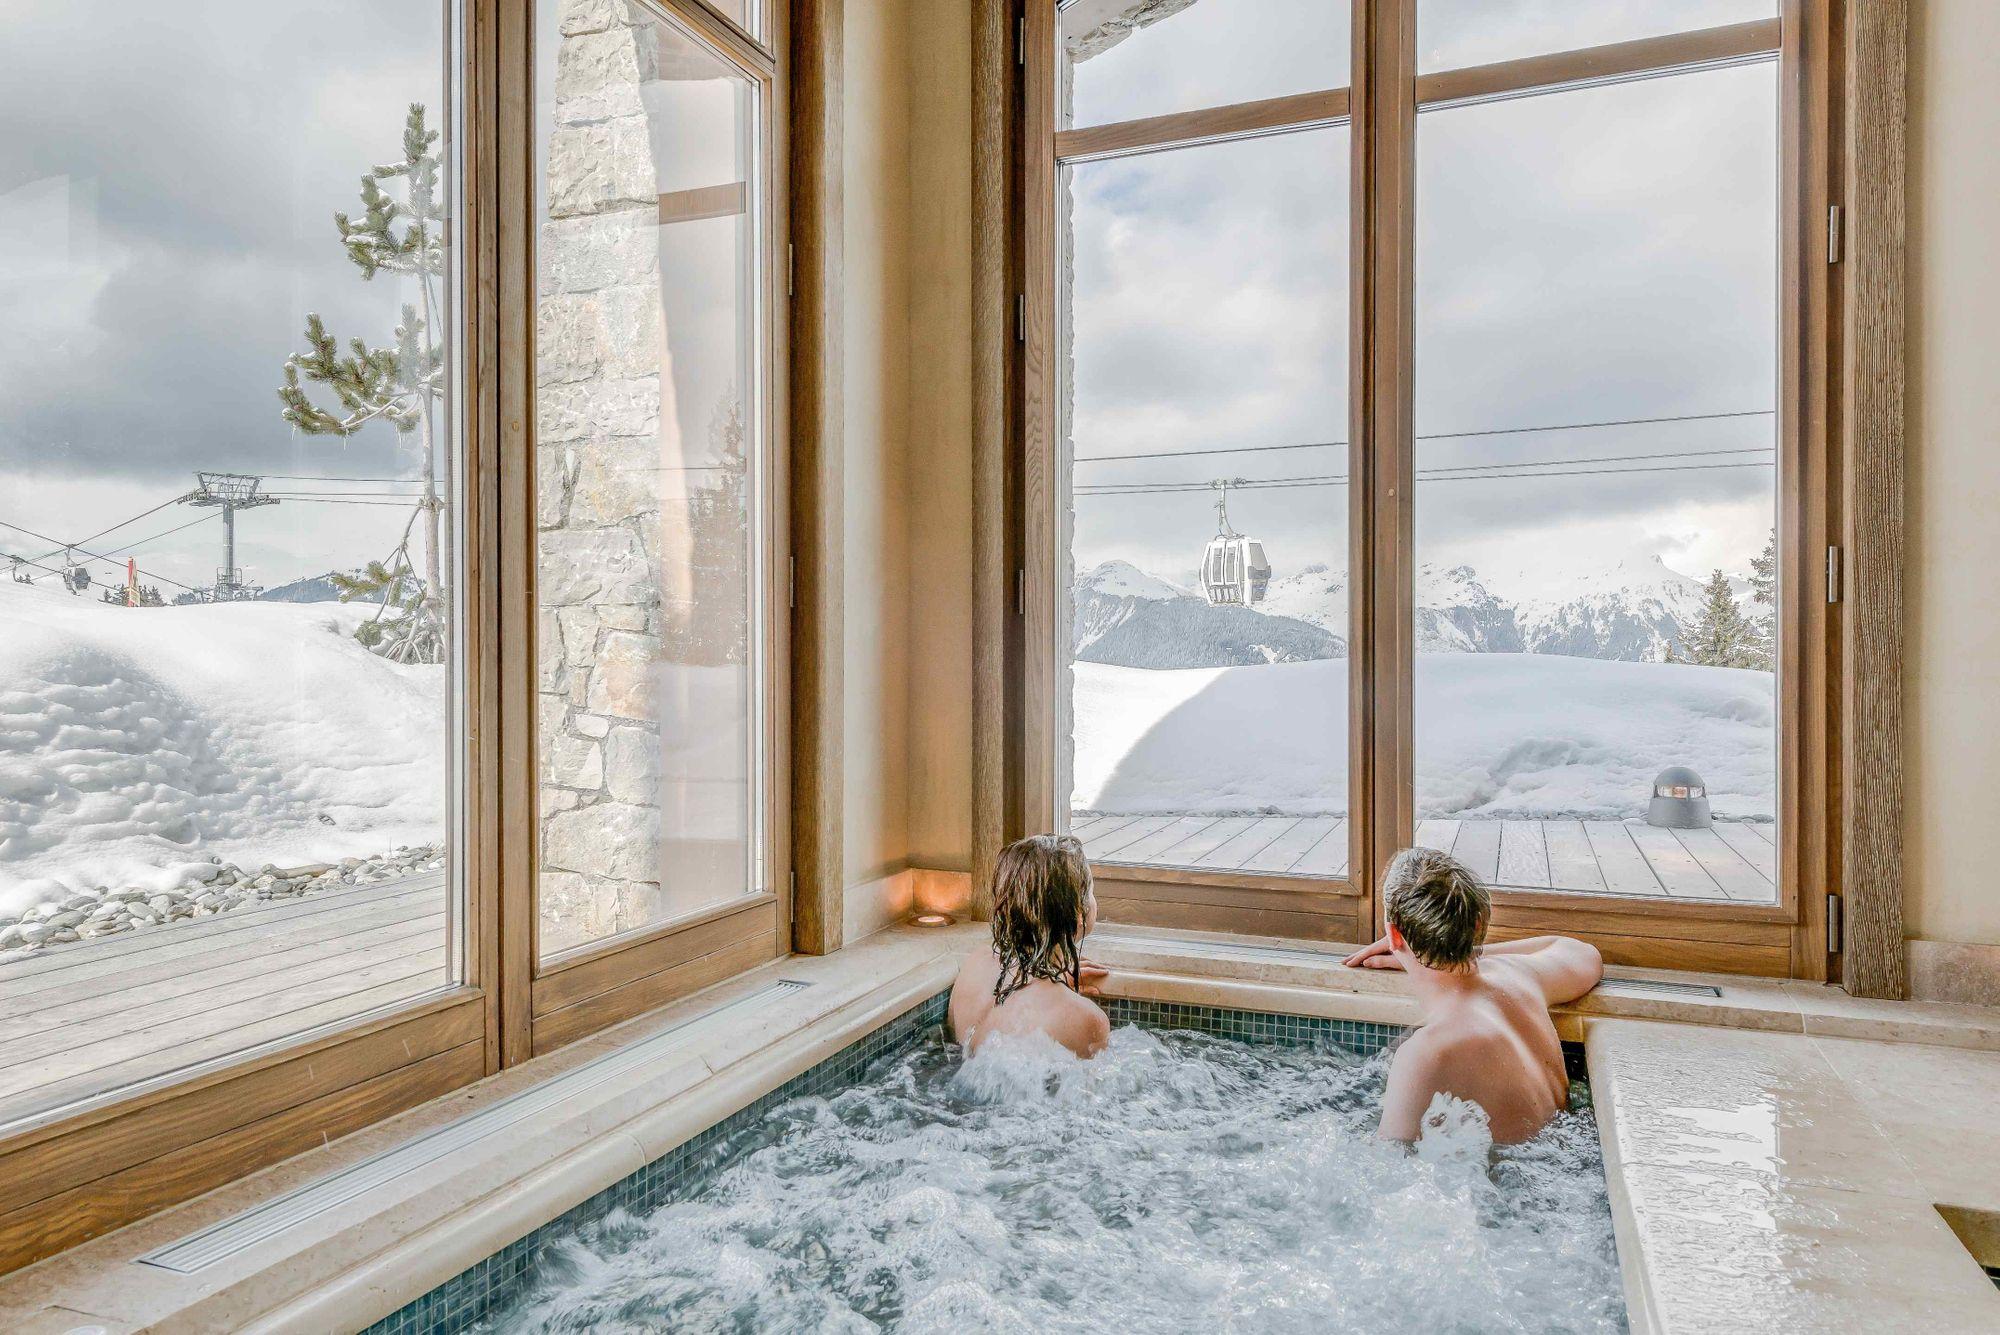 Indoor Jacuzzi Chalet Shemshak Lodge Colorado Resorts Indoor Jacuzzi Luxury Ski Chalet